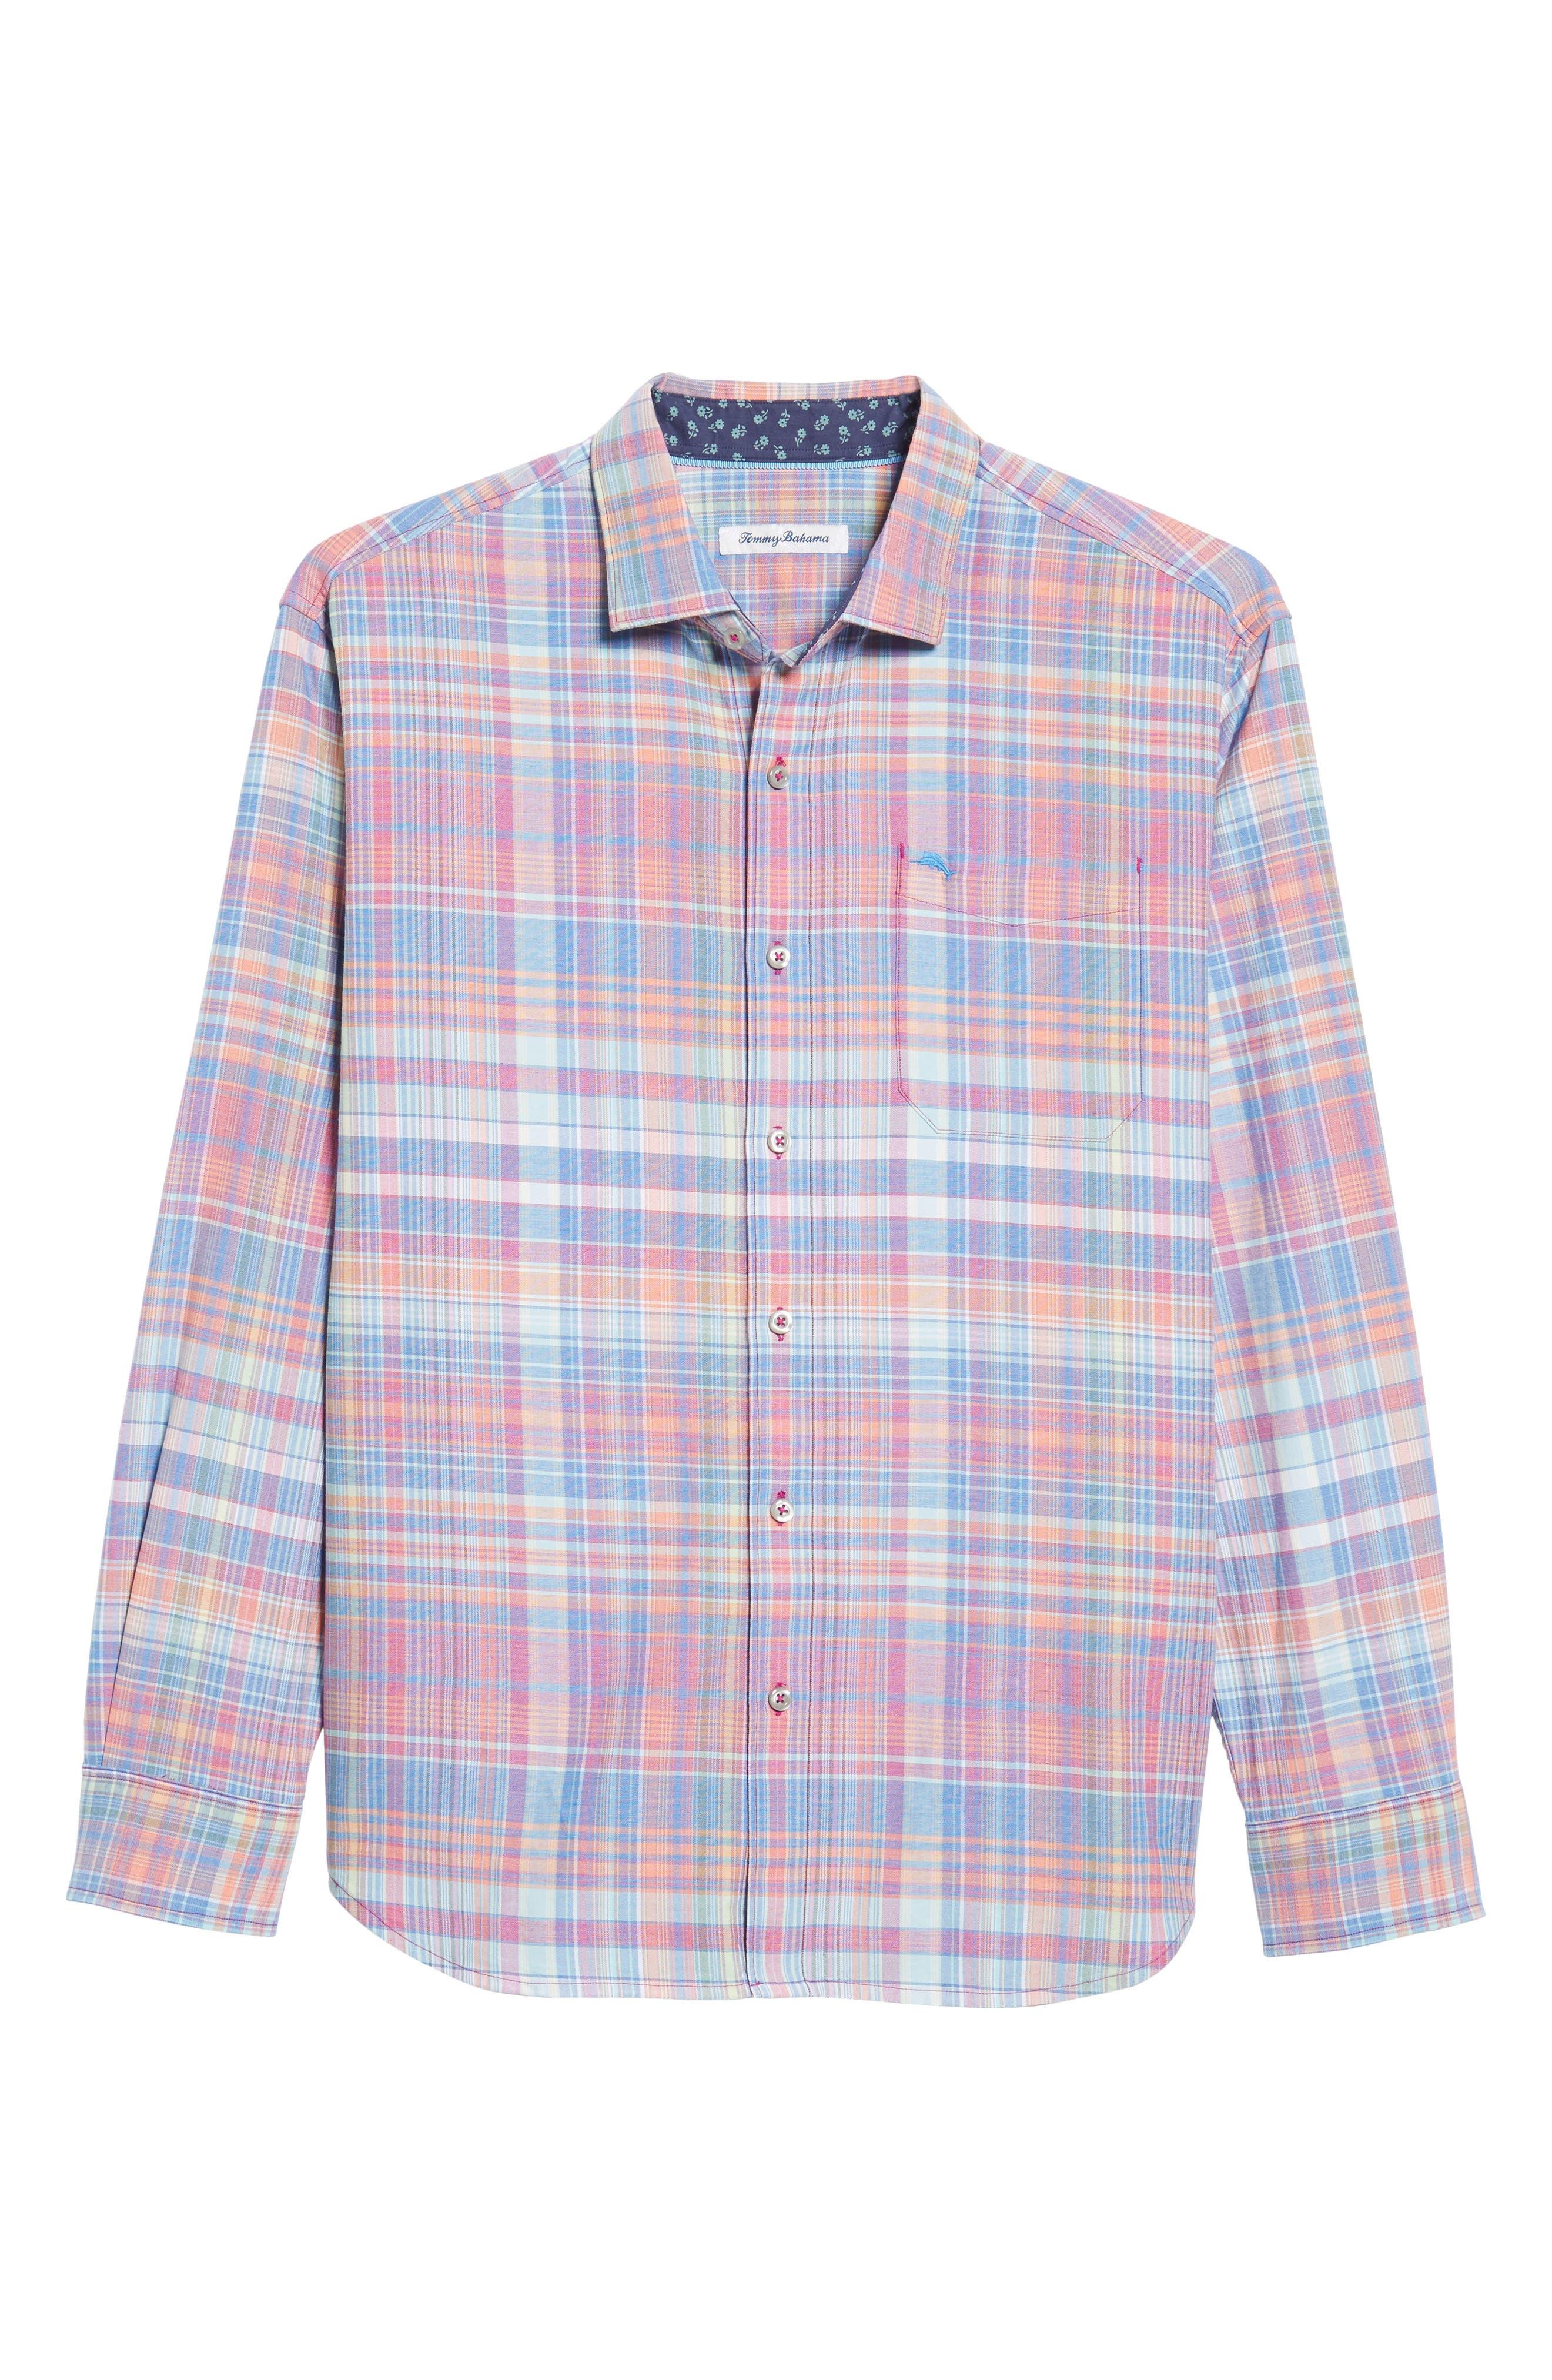 Mangrove Madras Regular Fit Sport Shirt,                             Alternate thumbnail 6, color,                             650